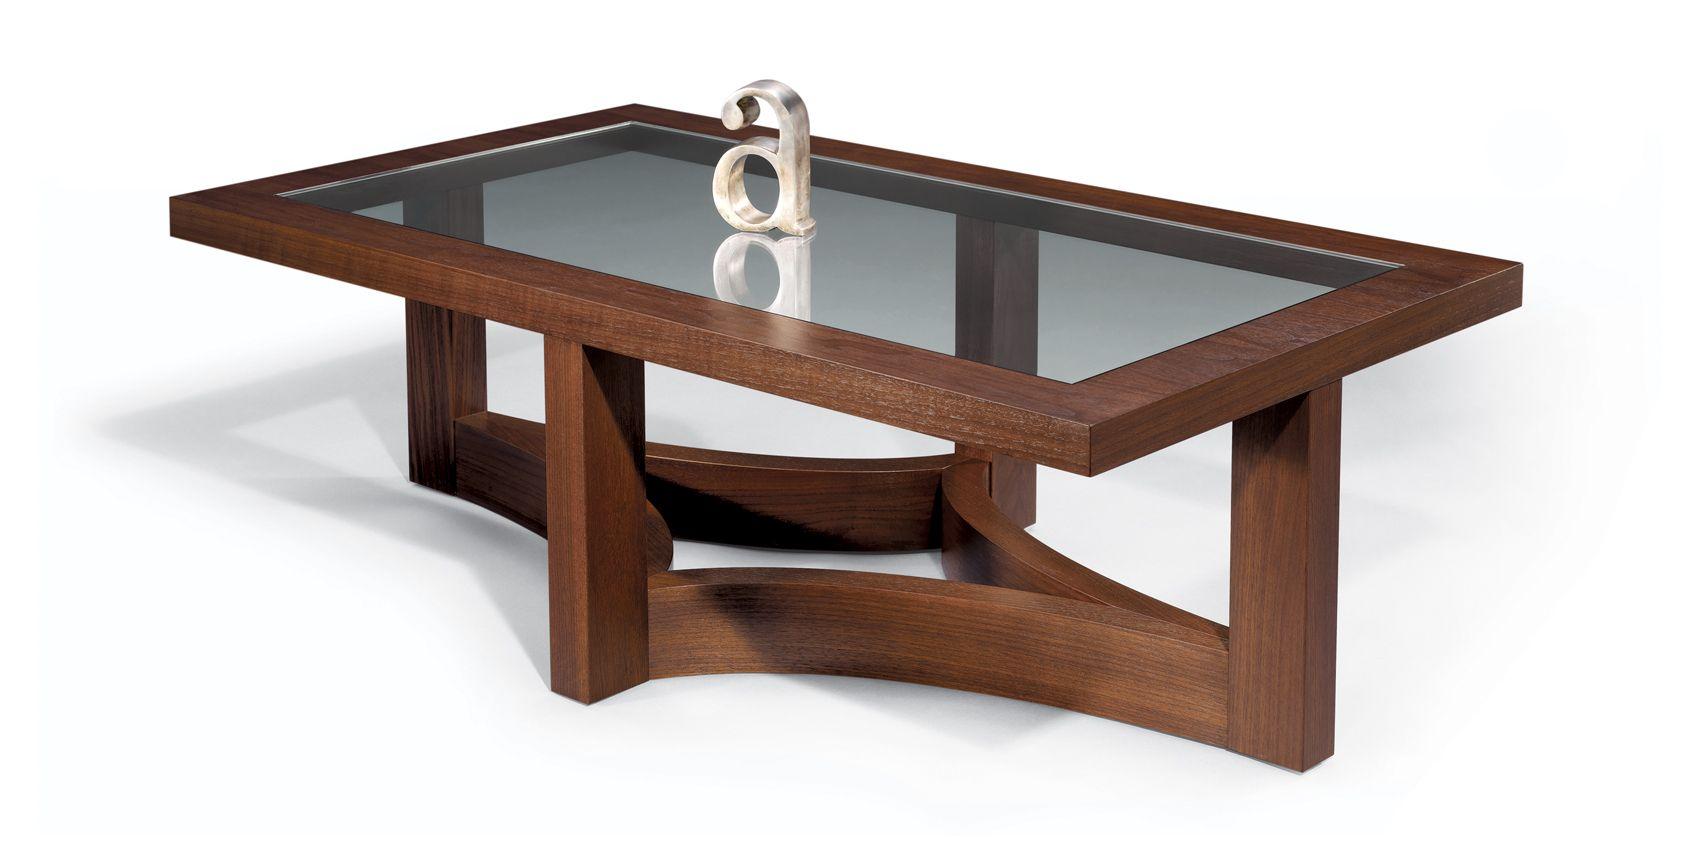 Nexus Cocktail Table Rectangular With Inset Glass Top Coffee Table Table Coffee Table Inspiration [ 867 x 1708 Pixel ]